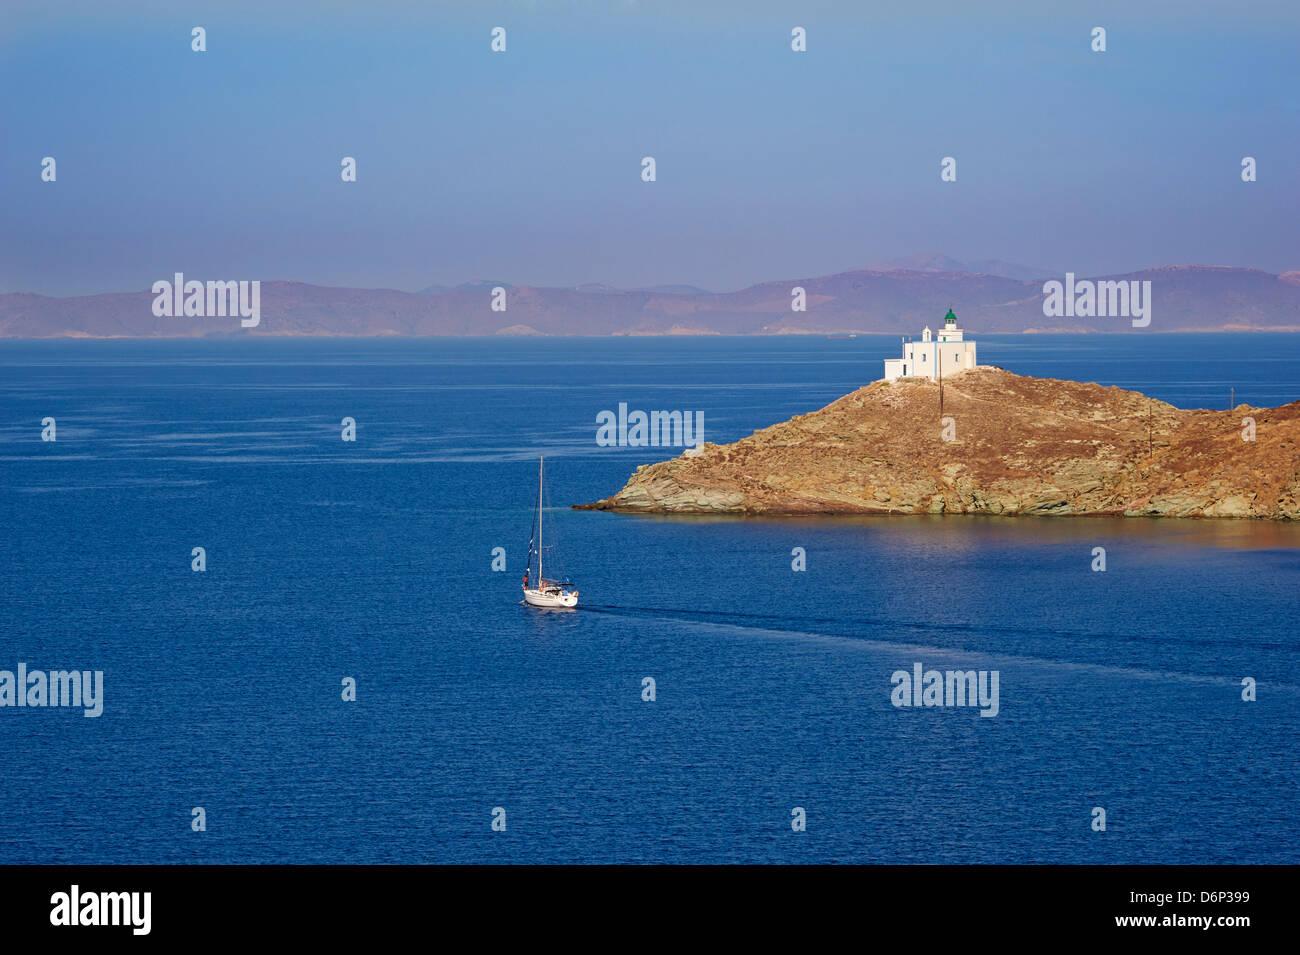 Agios Nikolaos, Korissia Bay, Kea Island, Cyclades, Greek Islands, Greece, Europe - Stock Image